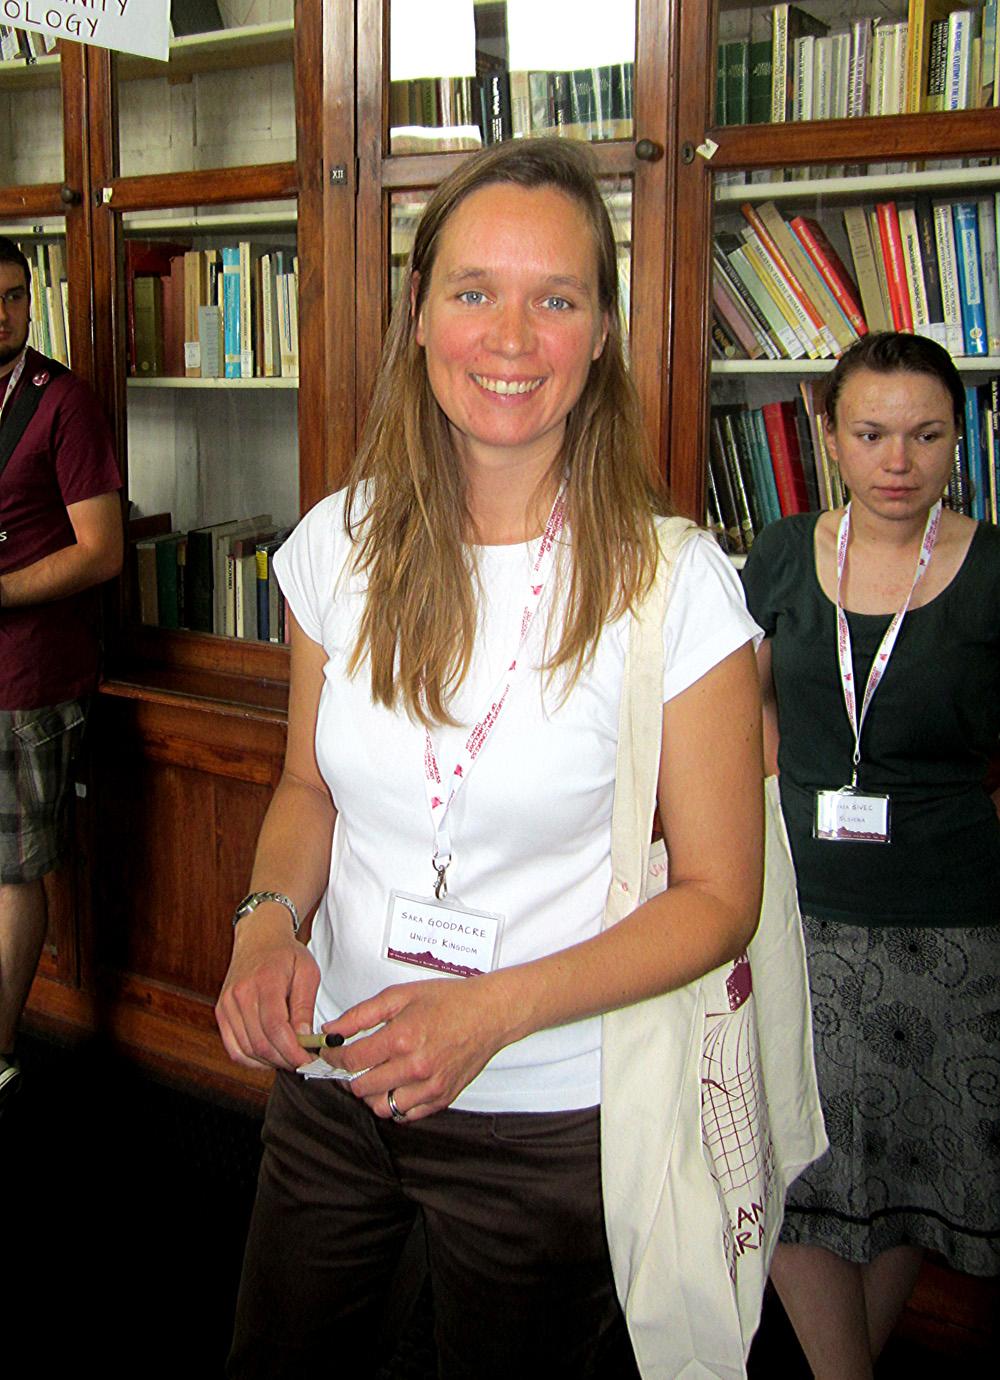 Sara Goodacre